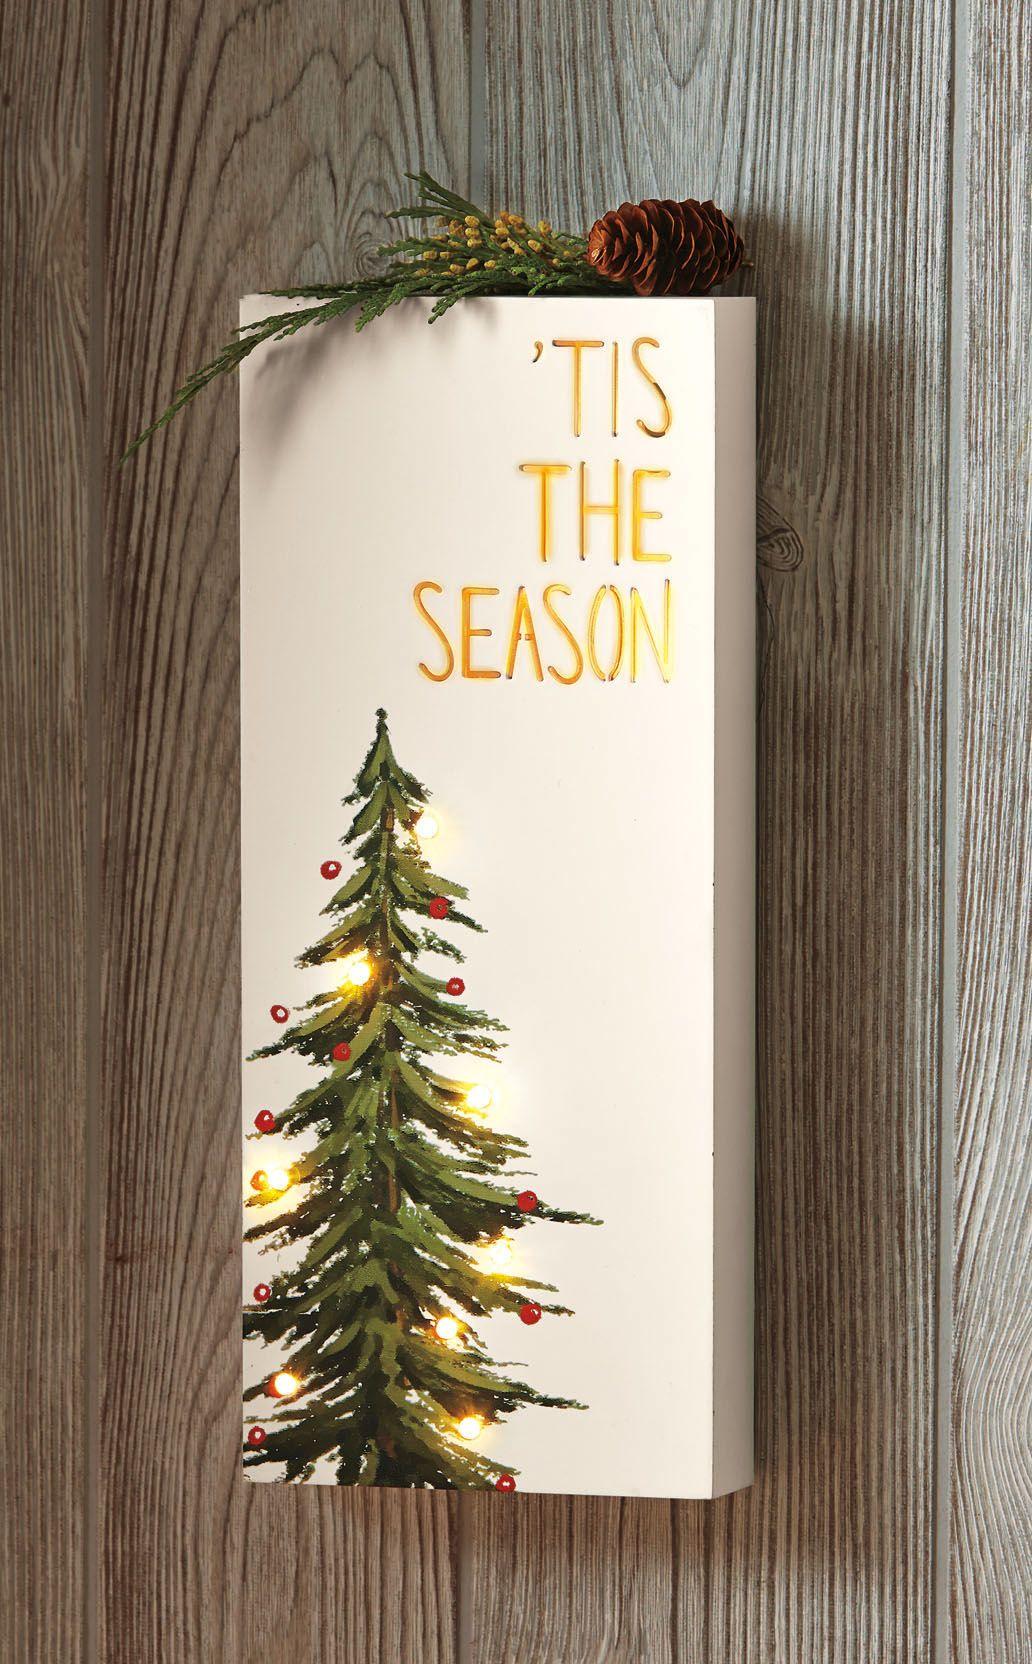 Tis The Season Light Up Wall Decor Fall Holiday 2019